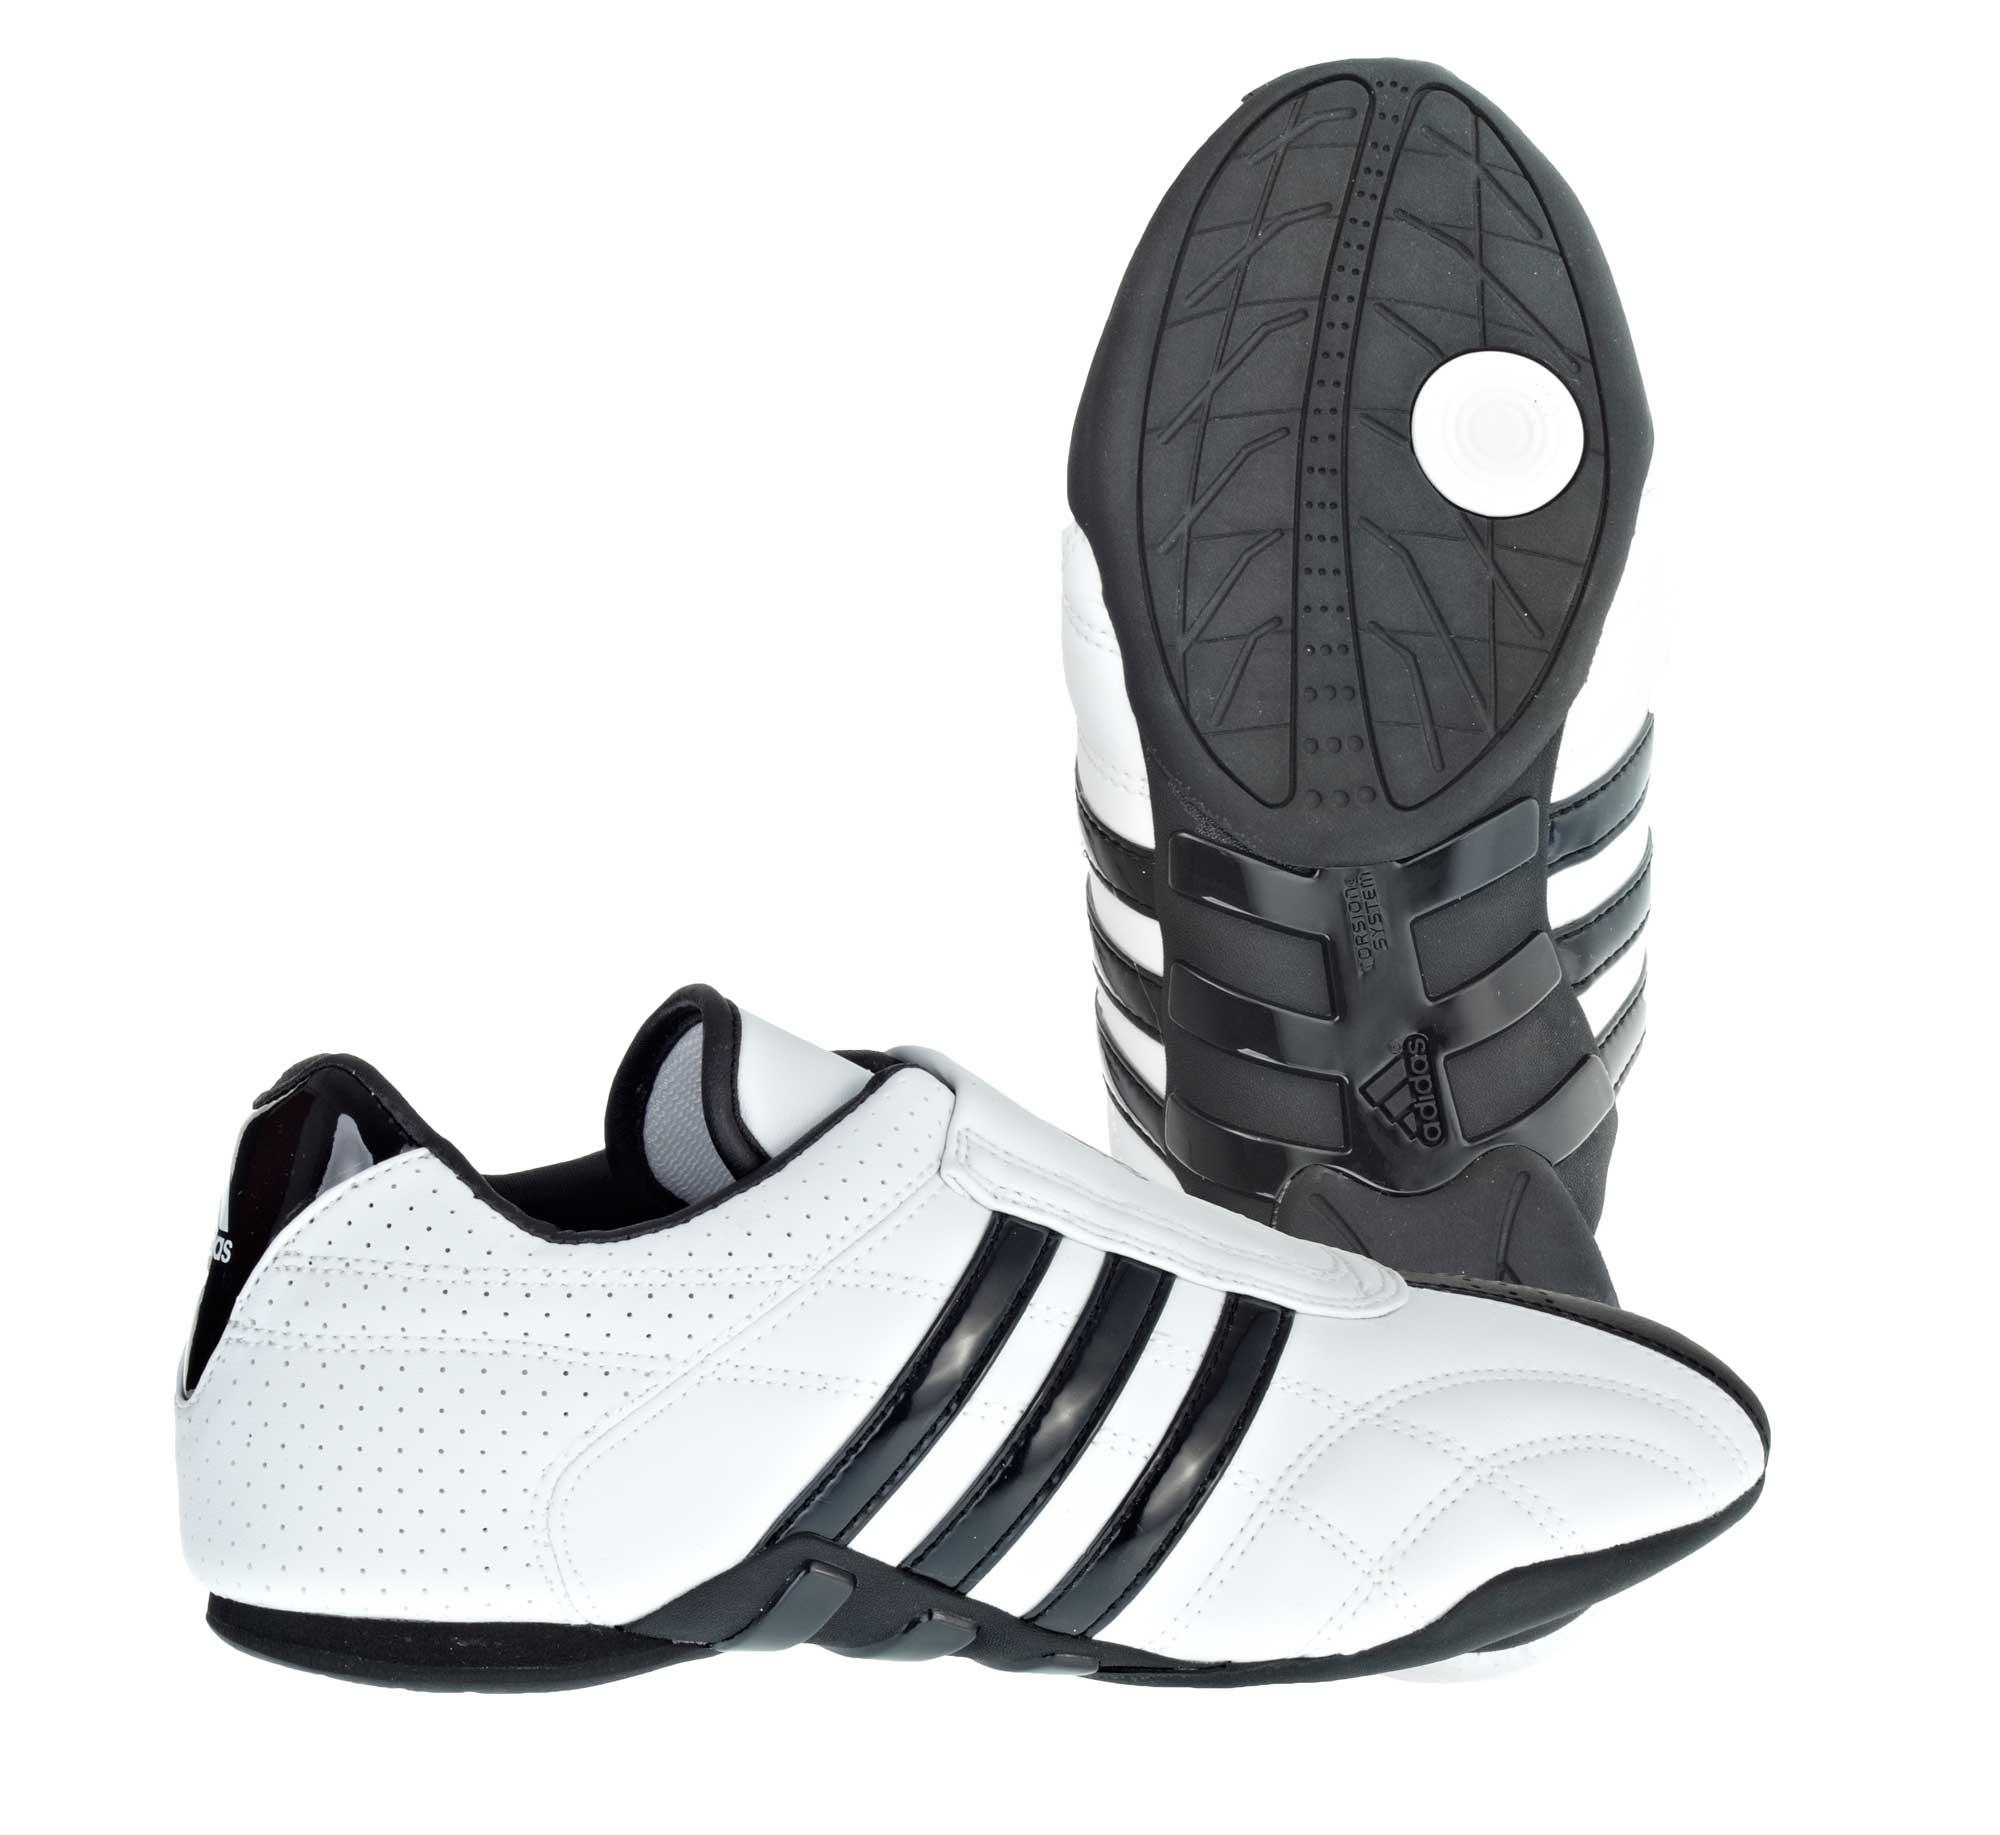 adidas adilux TKD sneakers white black stripes